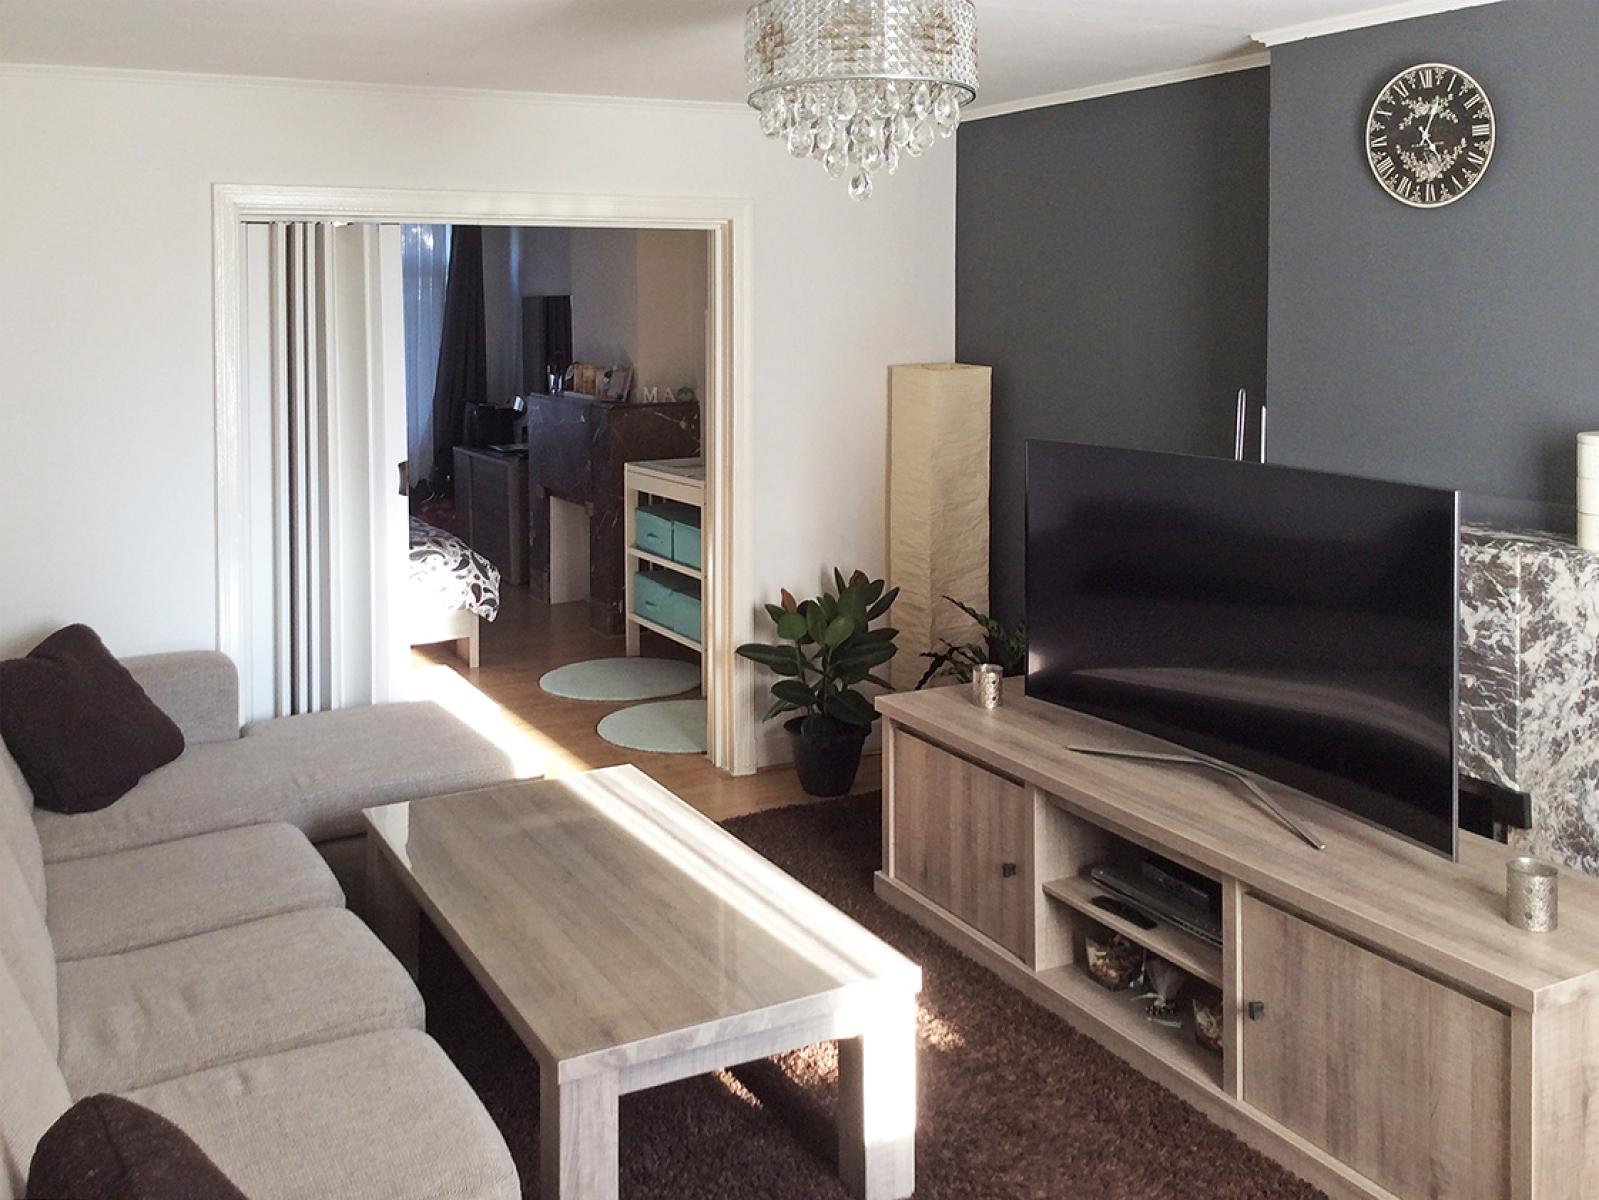 Charmant 2-slpk appartement op leuke locatie te Berchem! afbeelding 2